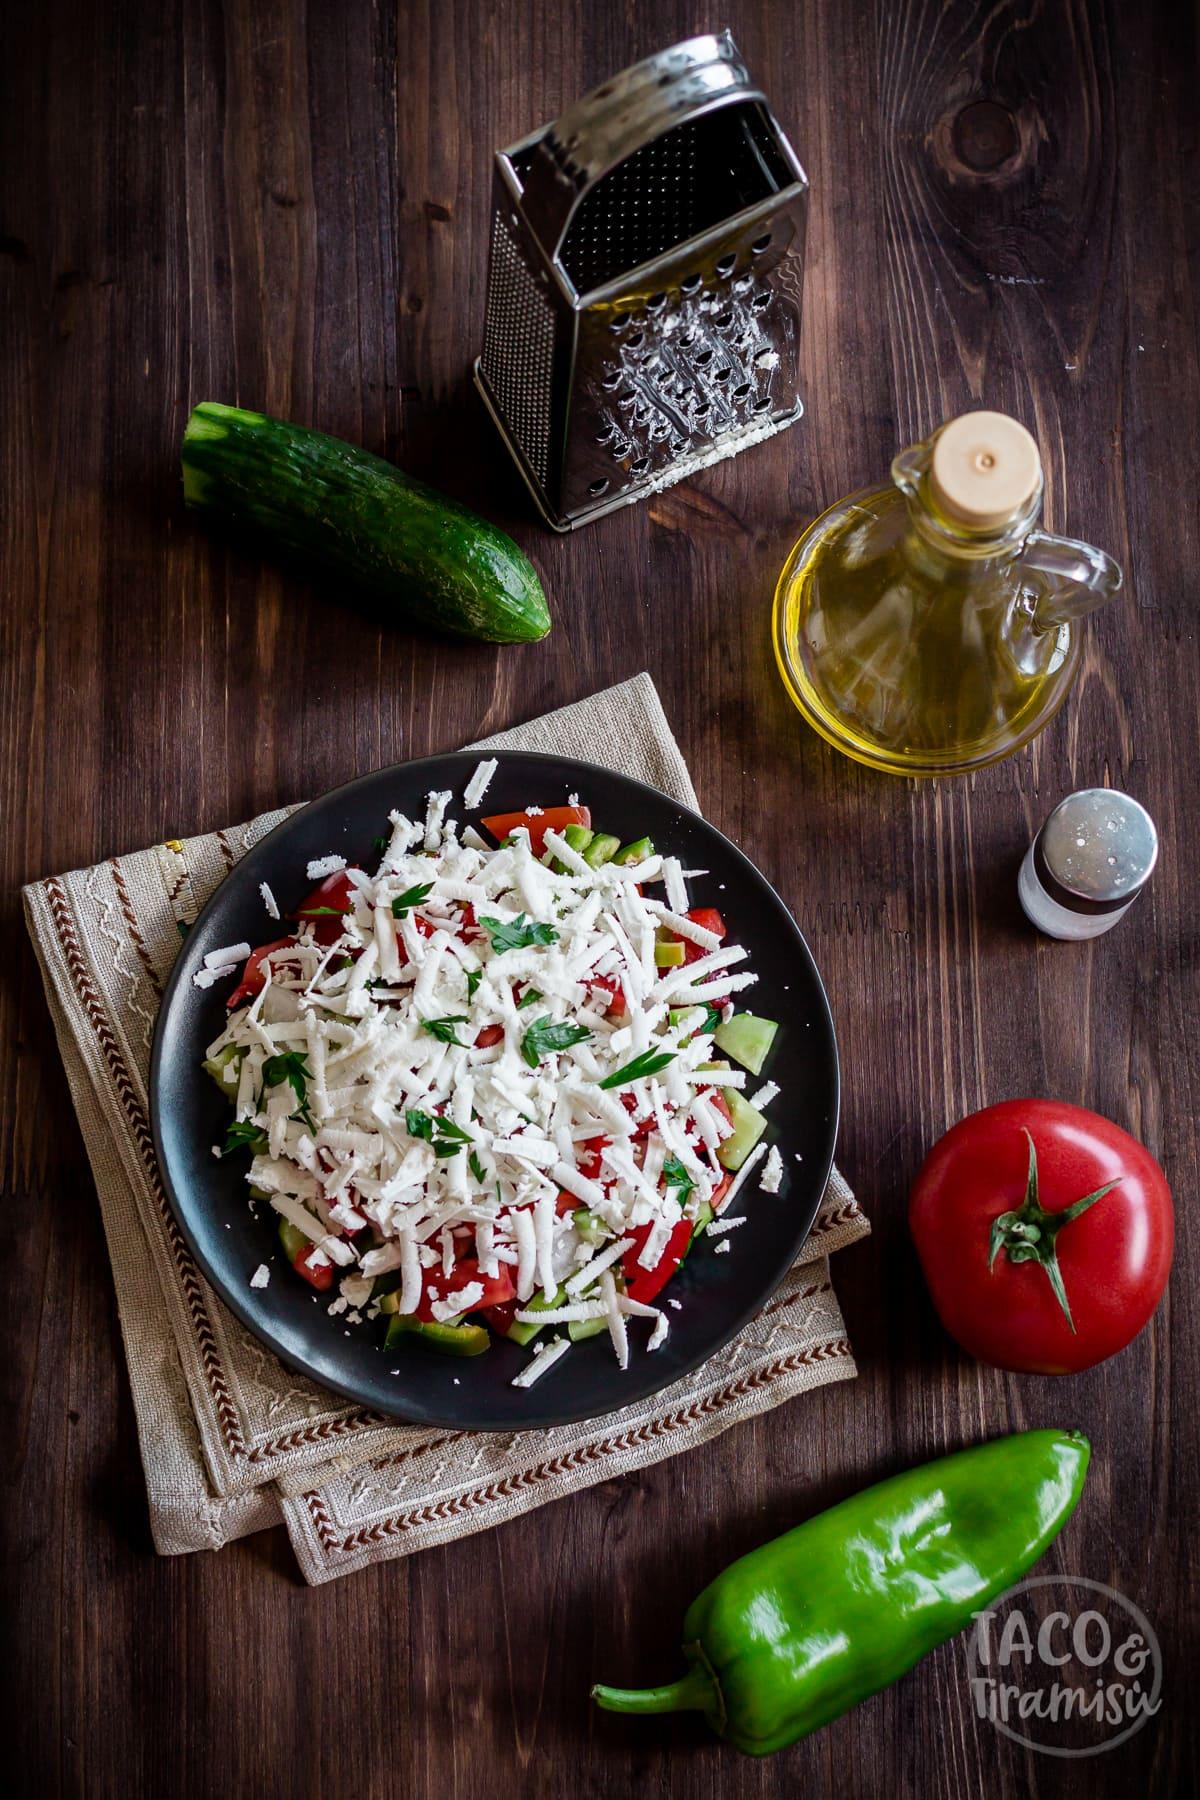 shopska salad served in a black plate with vegetables, oil and a grater aside